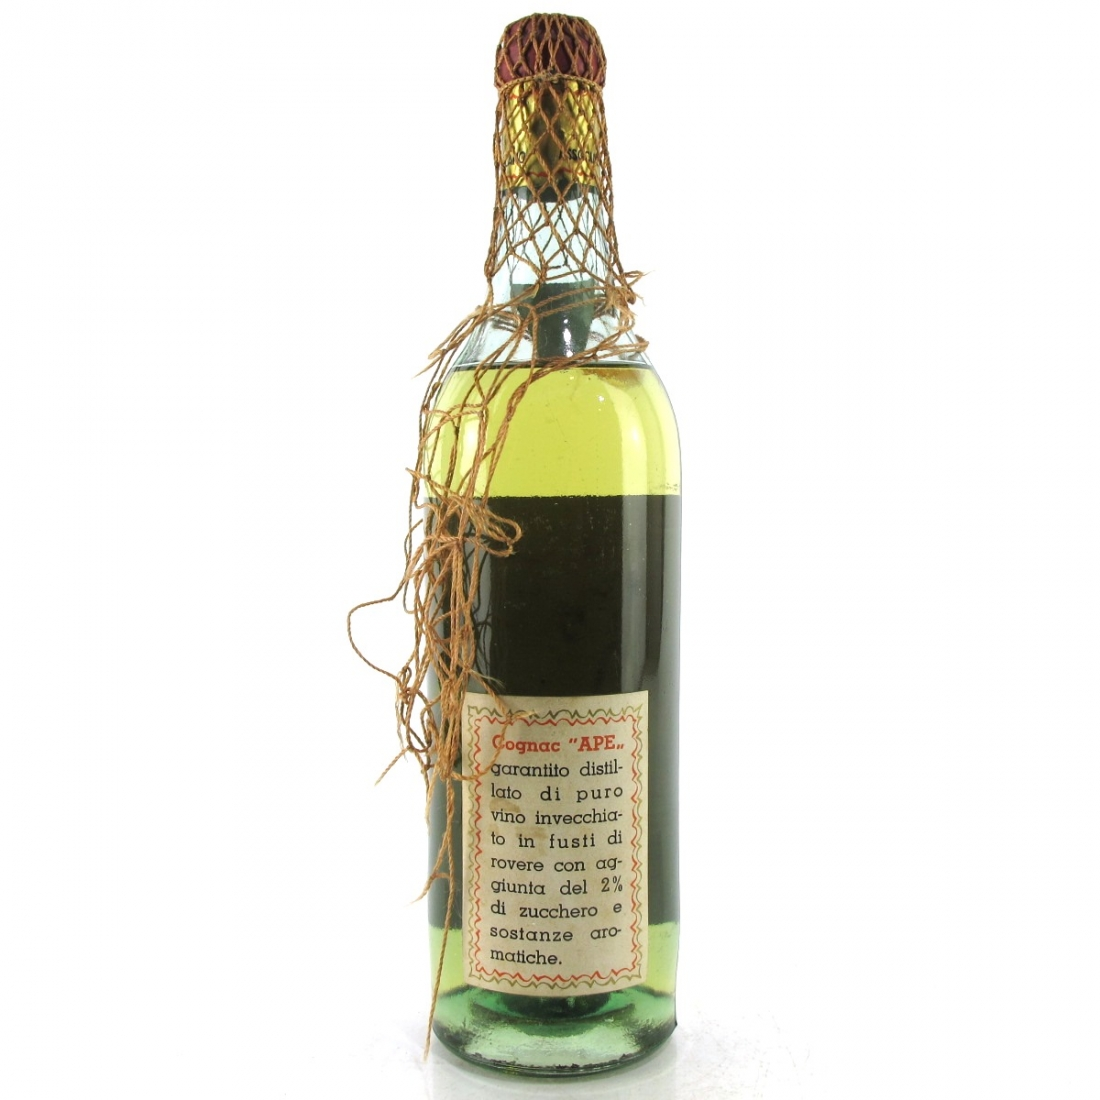 Ape Cognac Extra 1940s